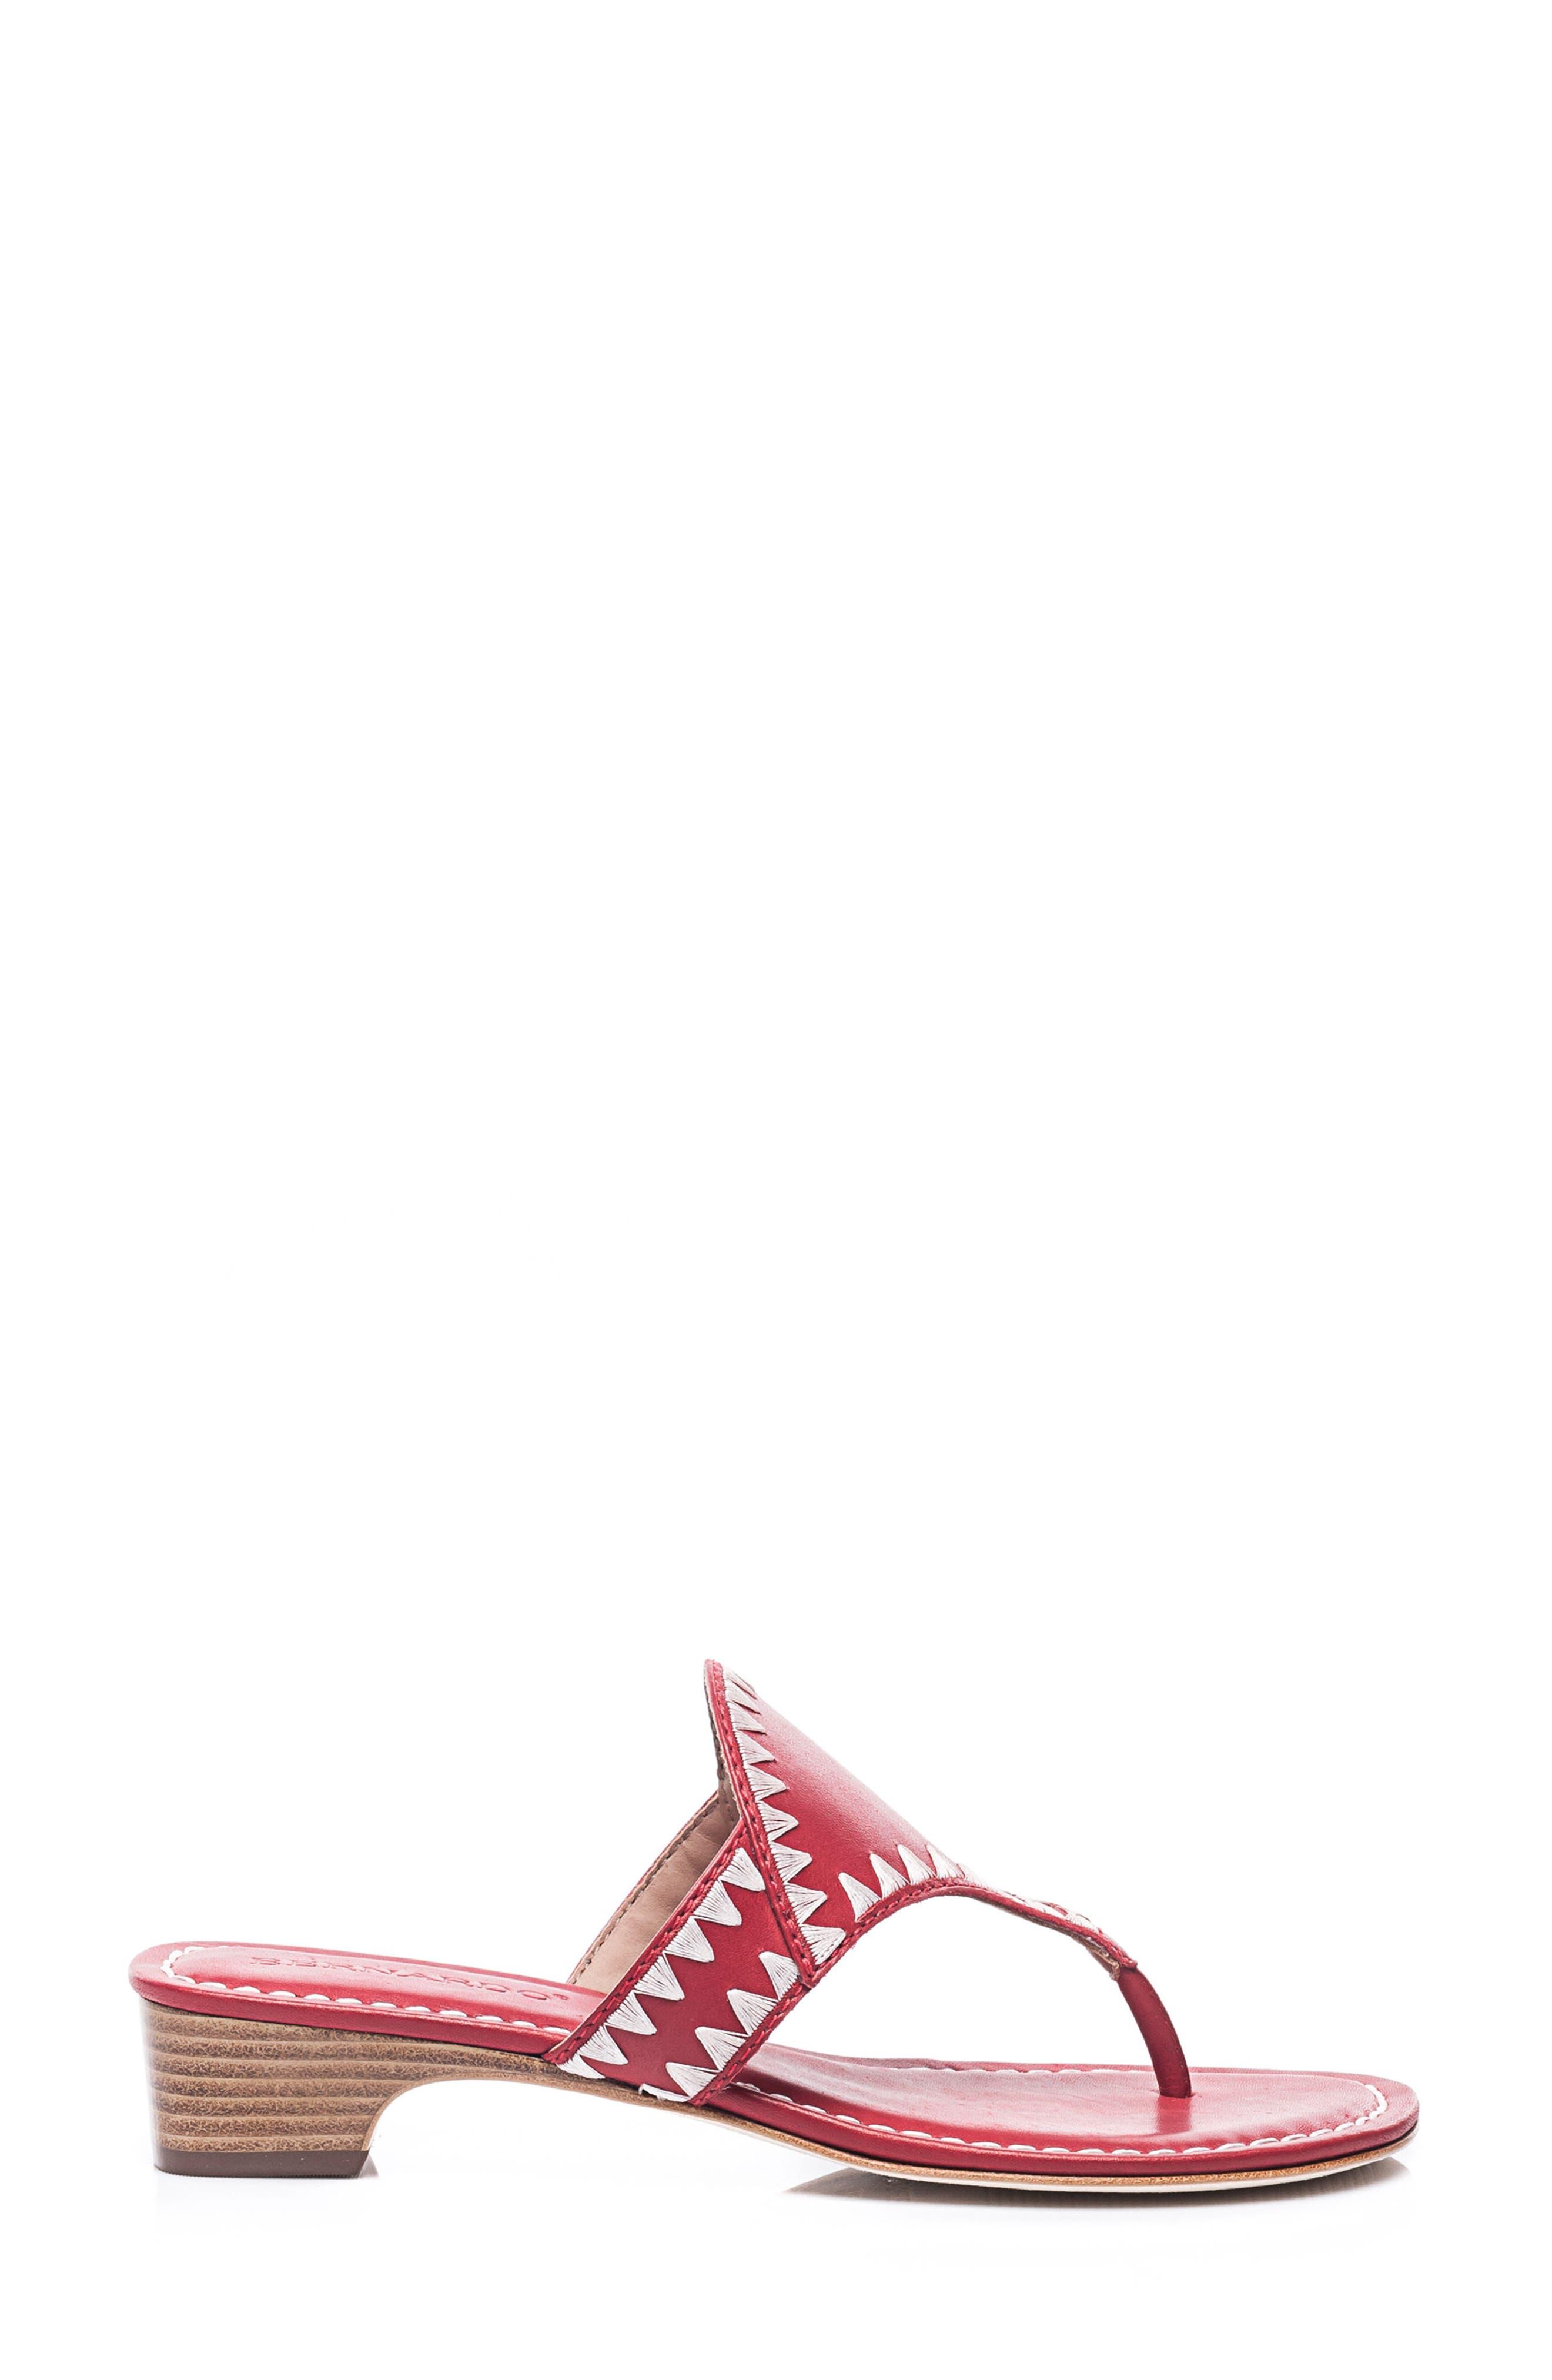 Bernardo Gabi Embroidered Sandal,                             Alternate thumbnail 3, color,                             RED LEATHER